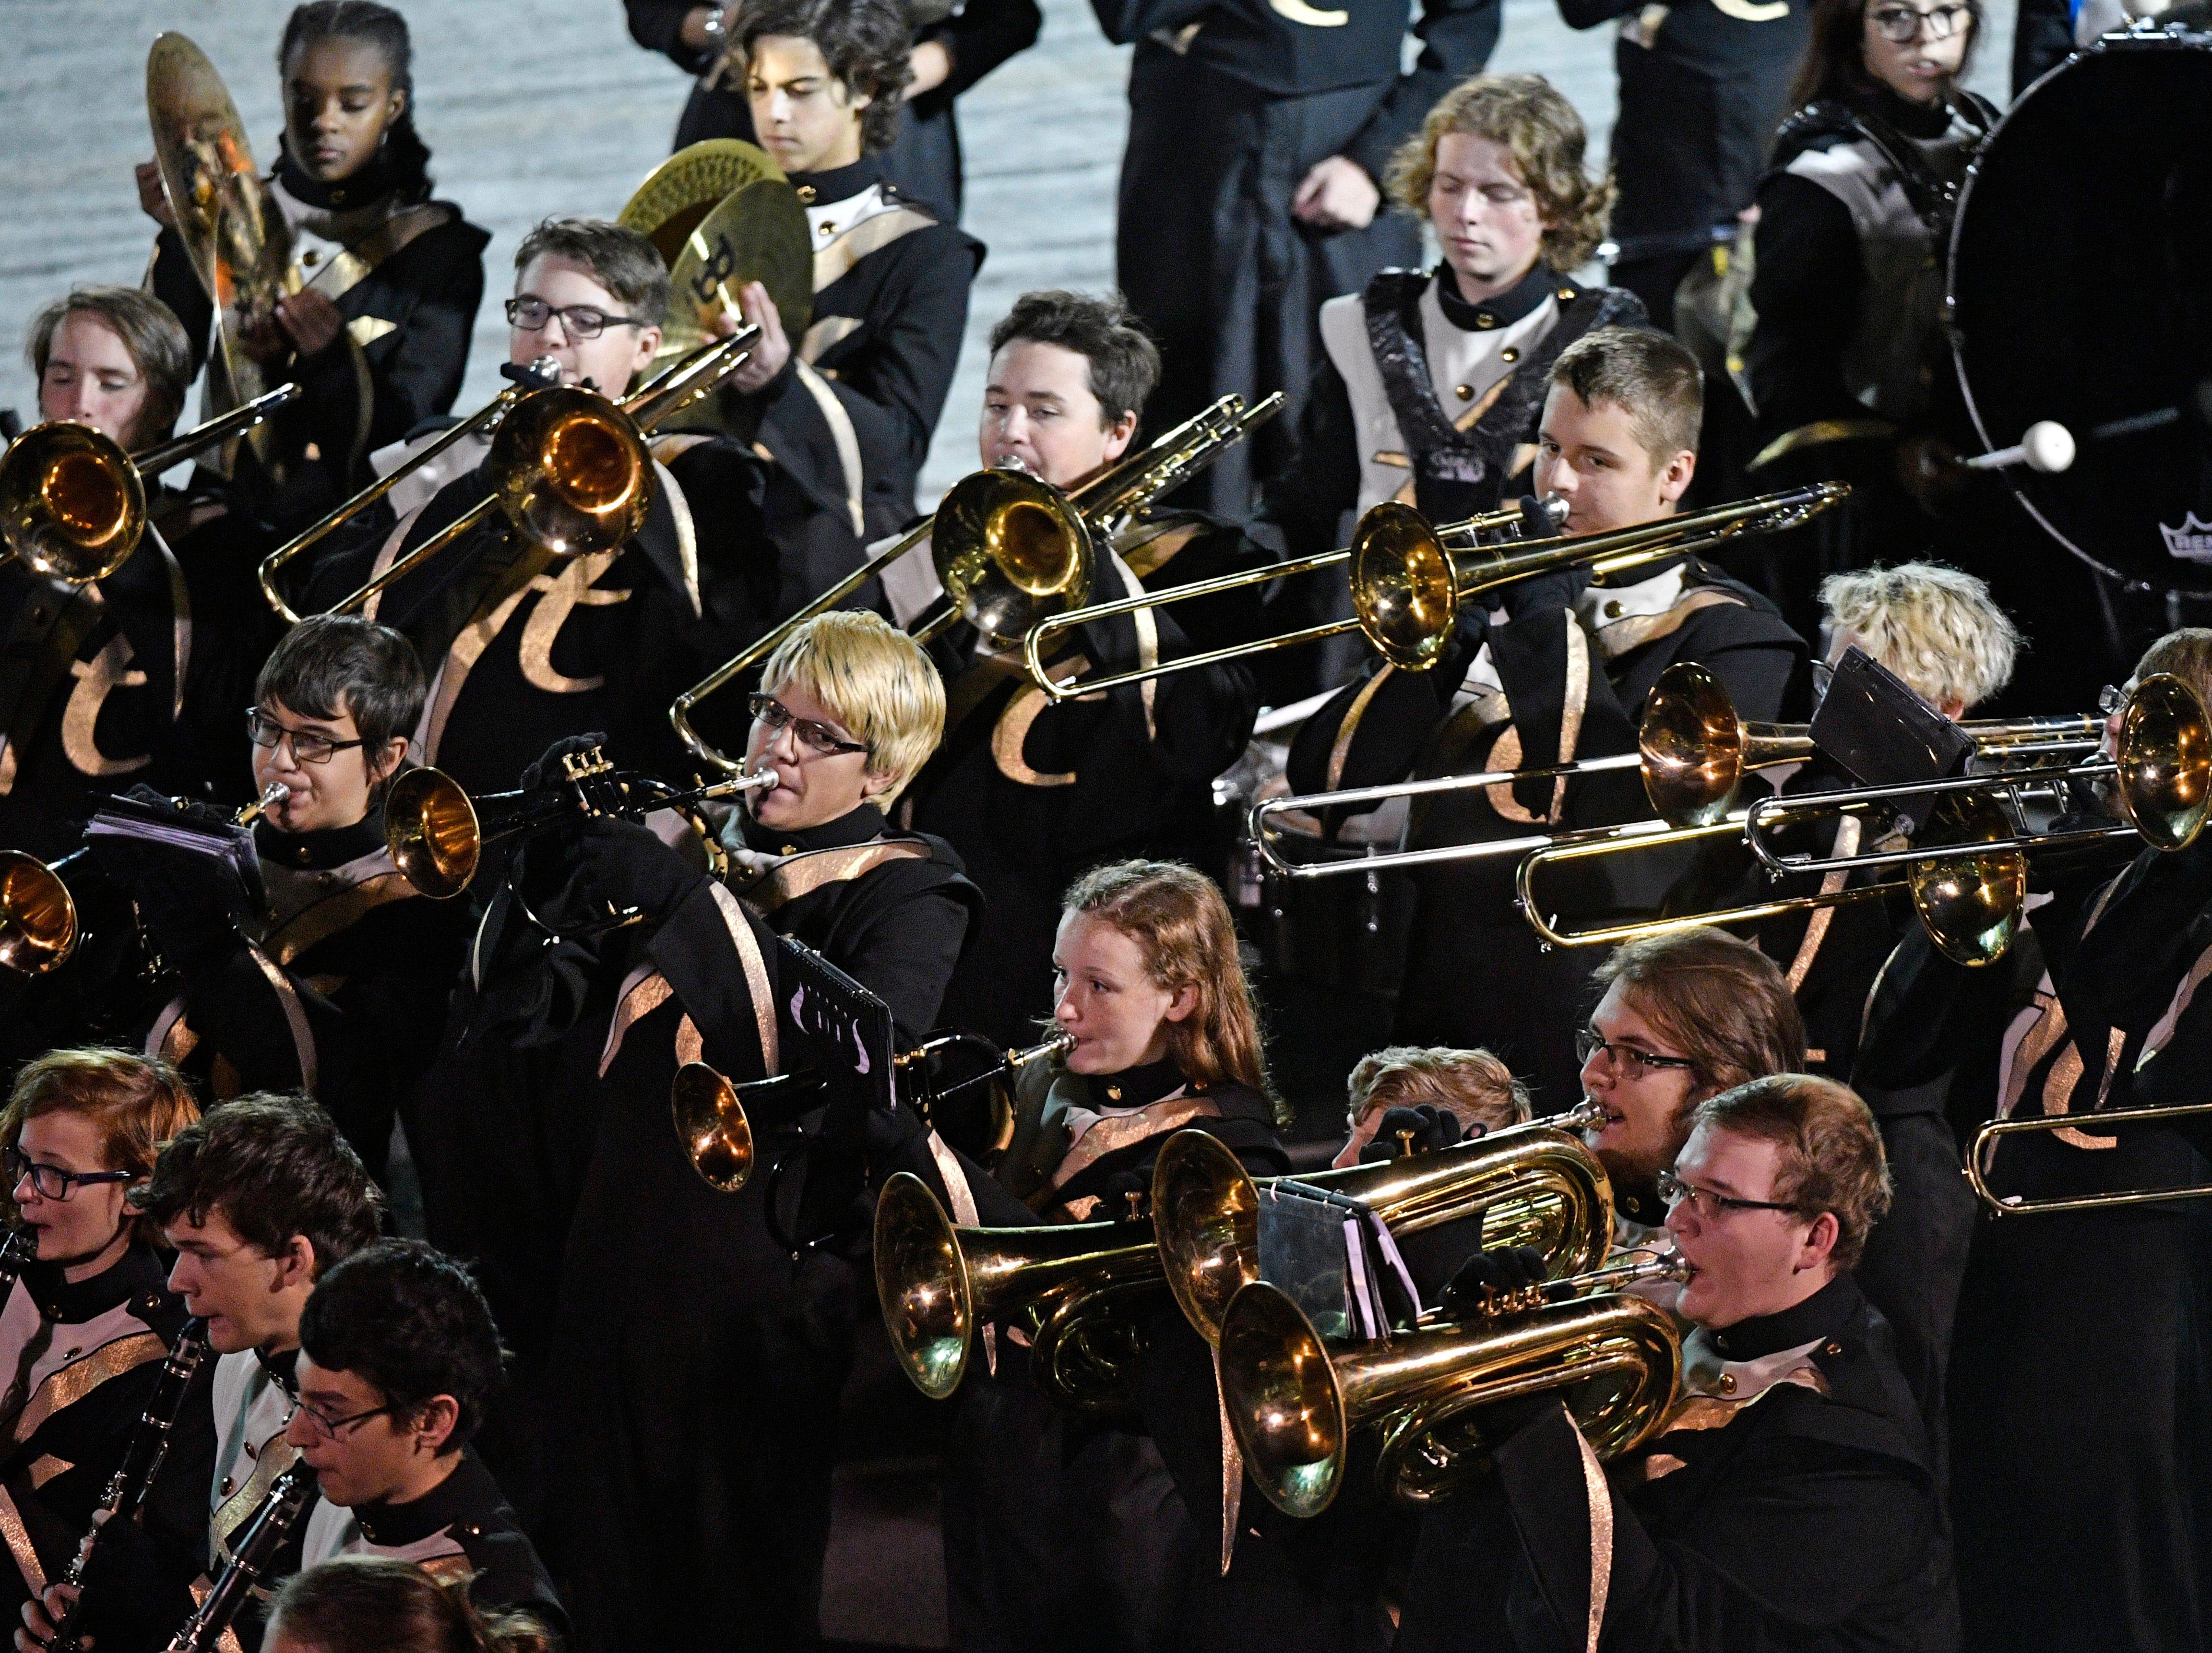 The Hendersonville Band plays the national anthem before Riverdale plays at Hendersonville Friday Nov. 2, 2018, in Hendersonville, Tenn.